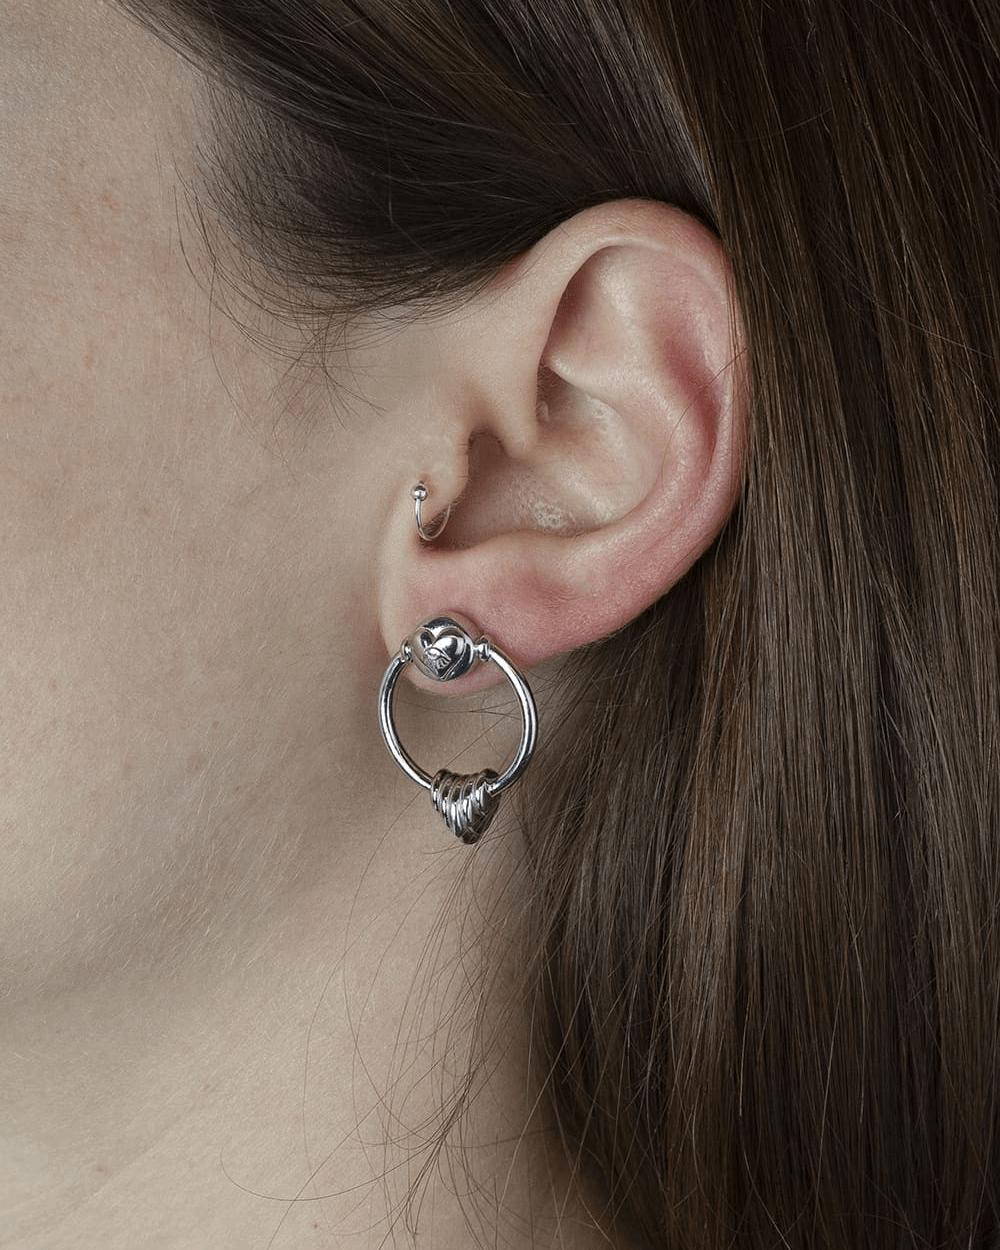 Earrings SILVER THE EMPRESS PAIR EARRINGS NOVE25